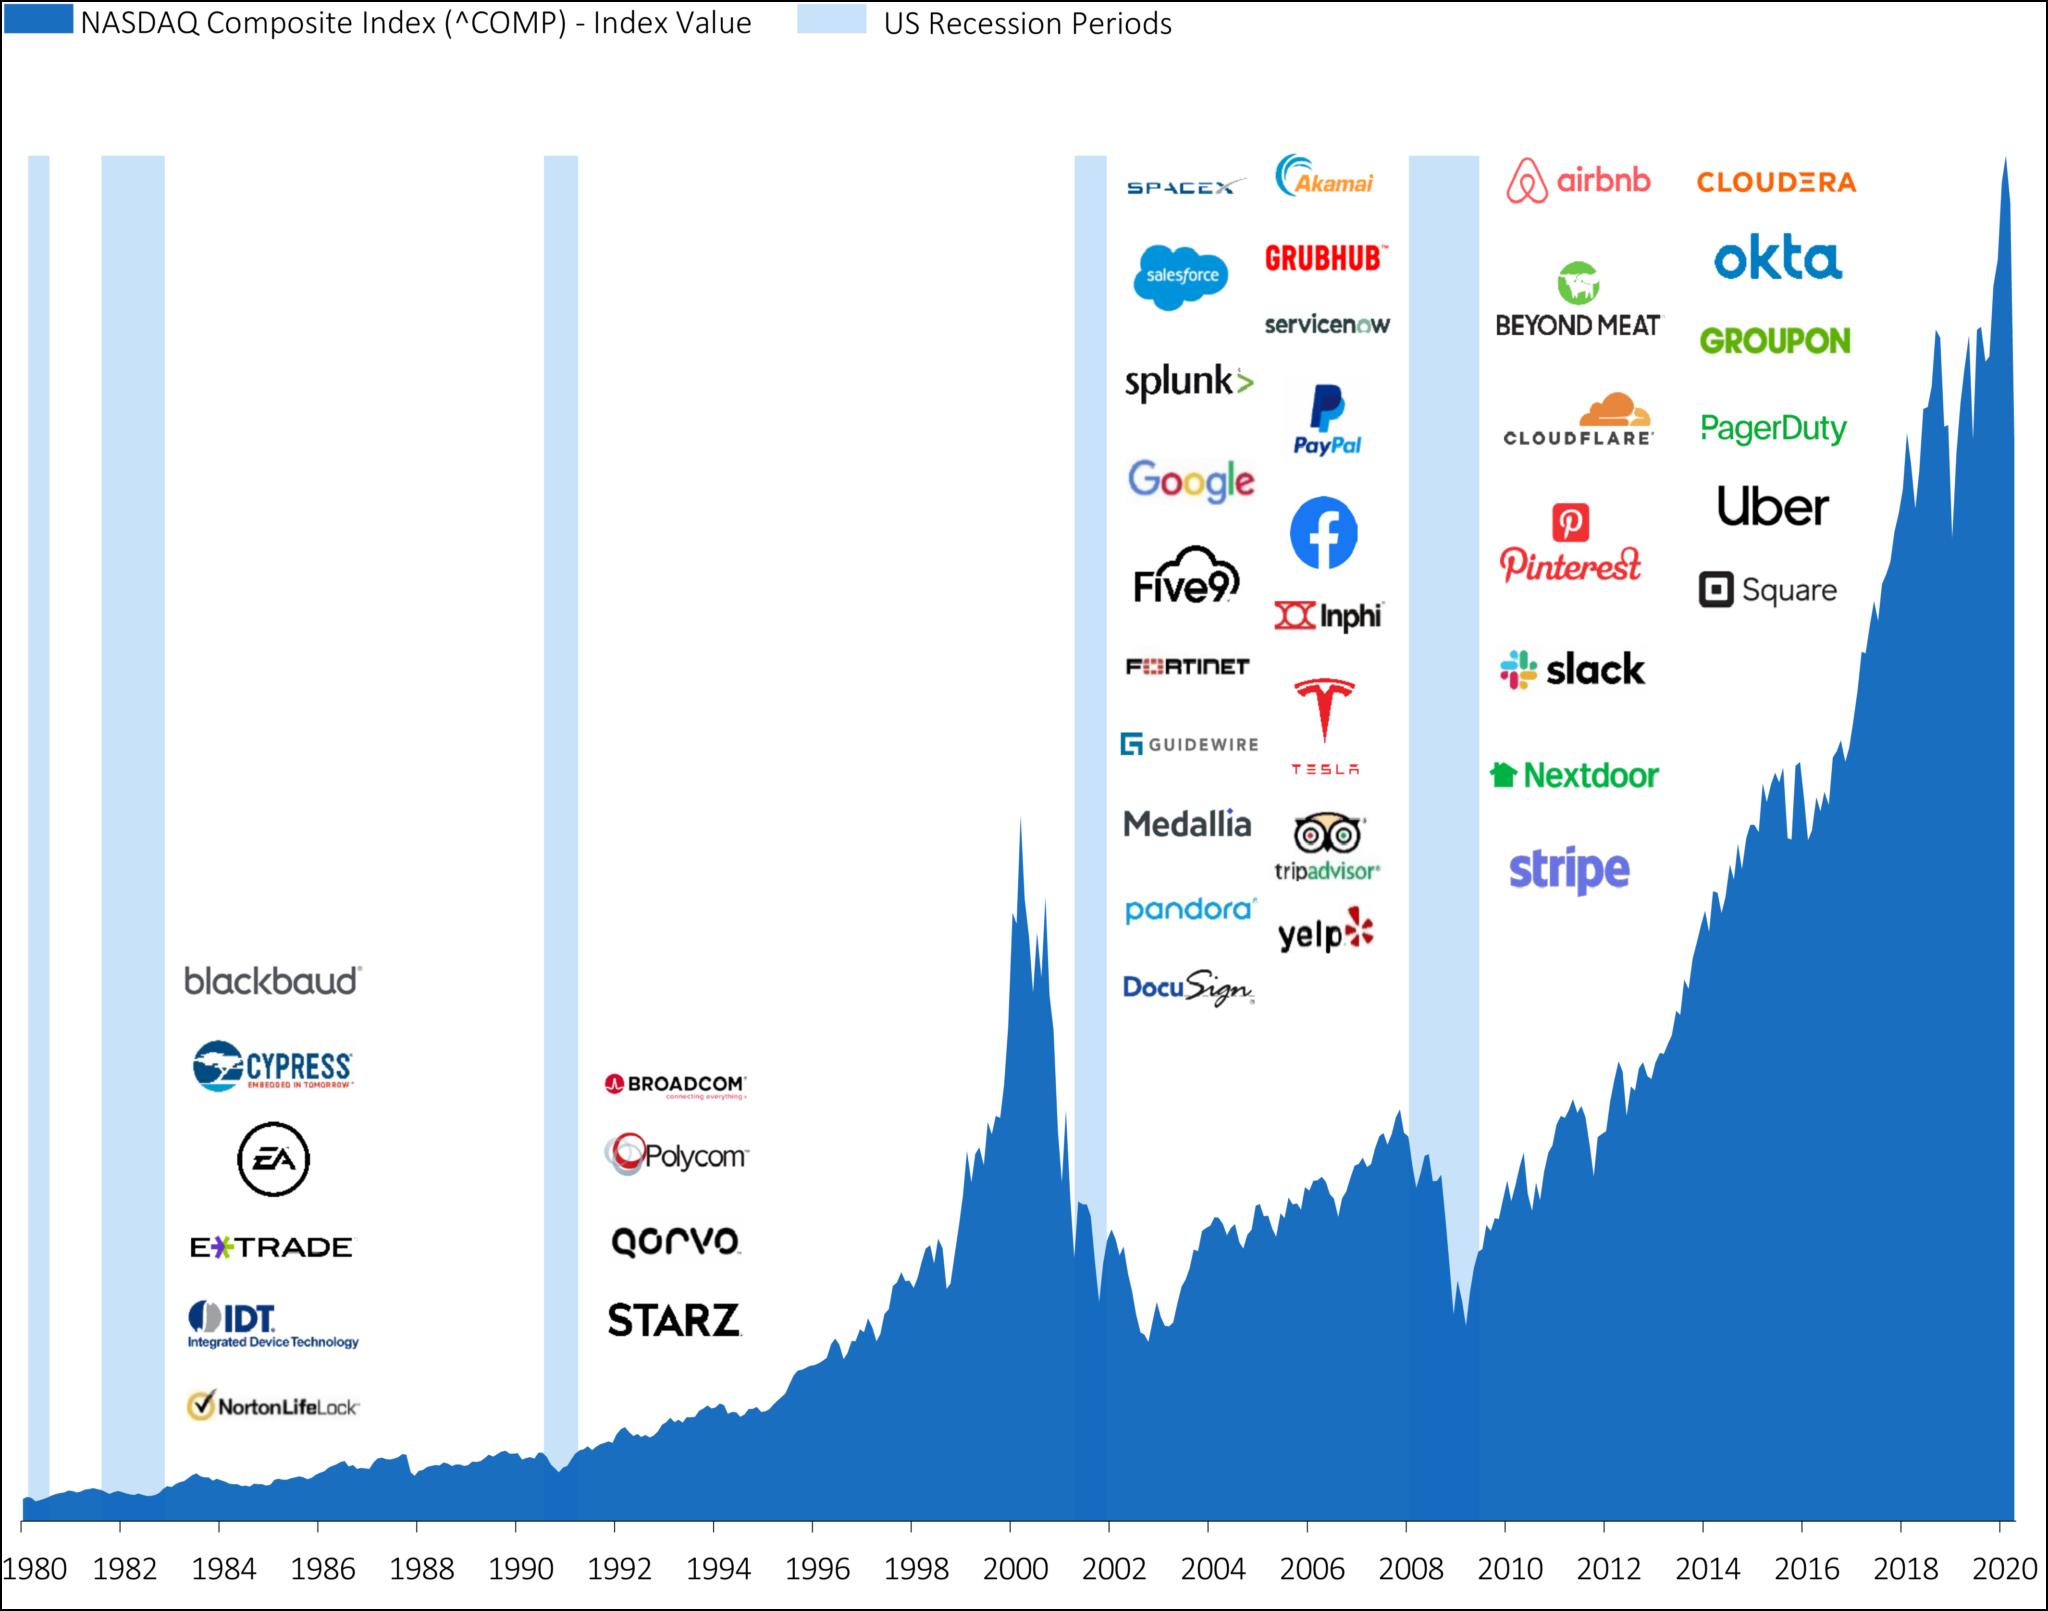 Вопреки пандемии и кризису: как биткоин-индустрия привлекала инвестиции в 2020 году